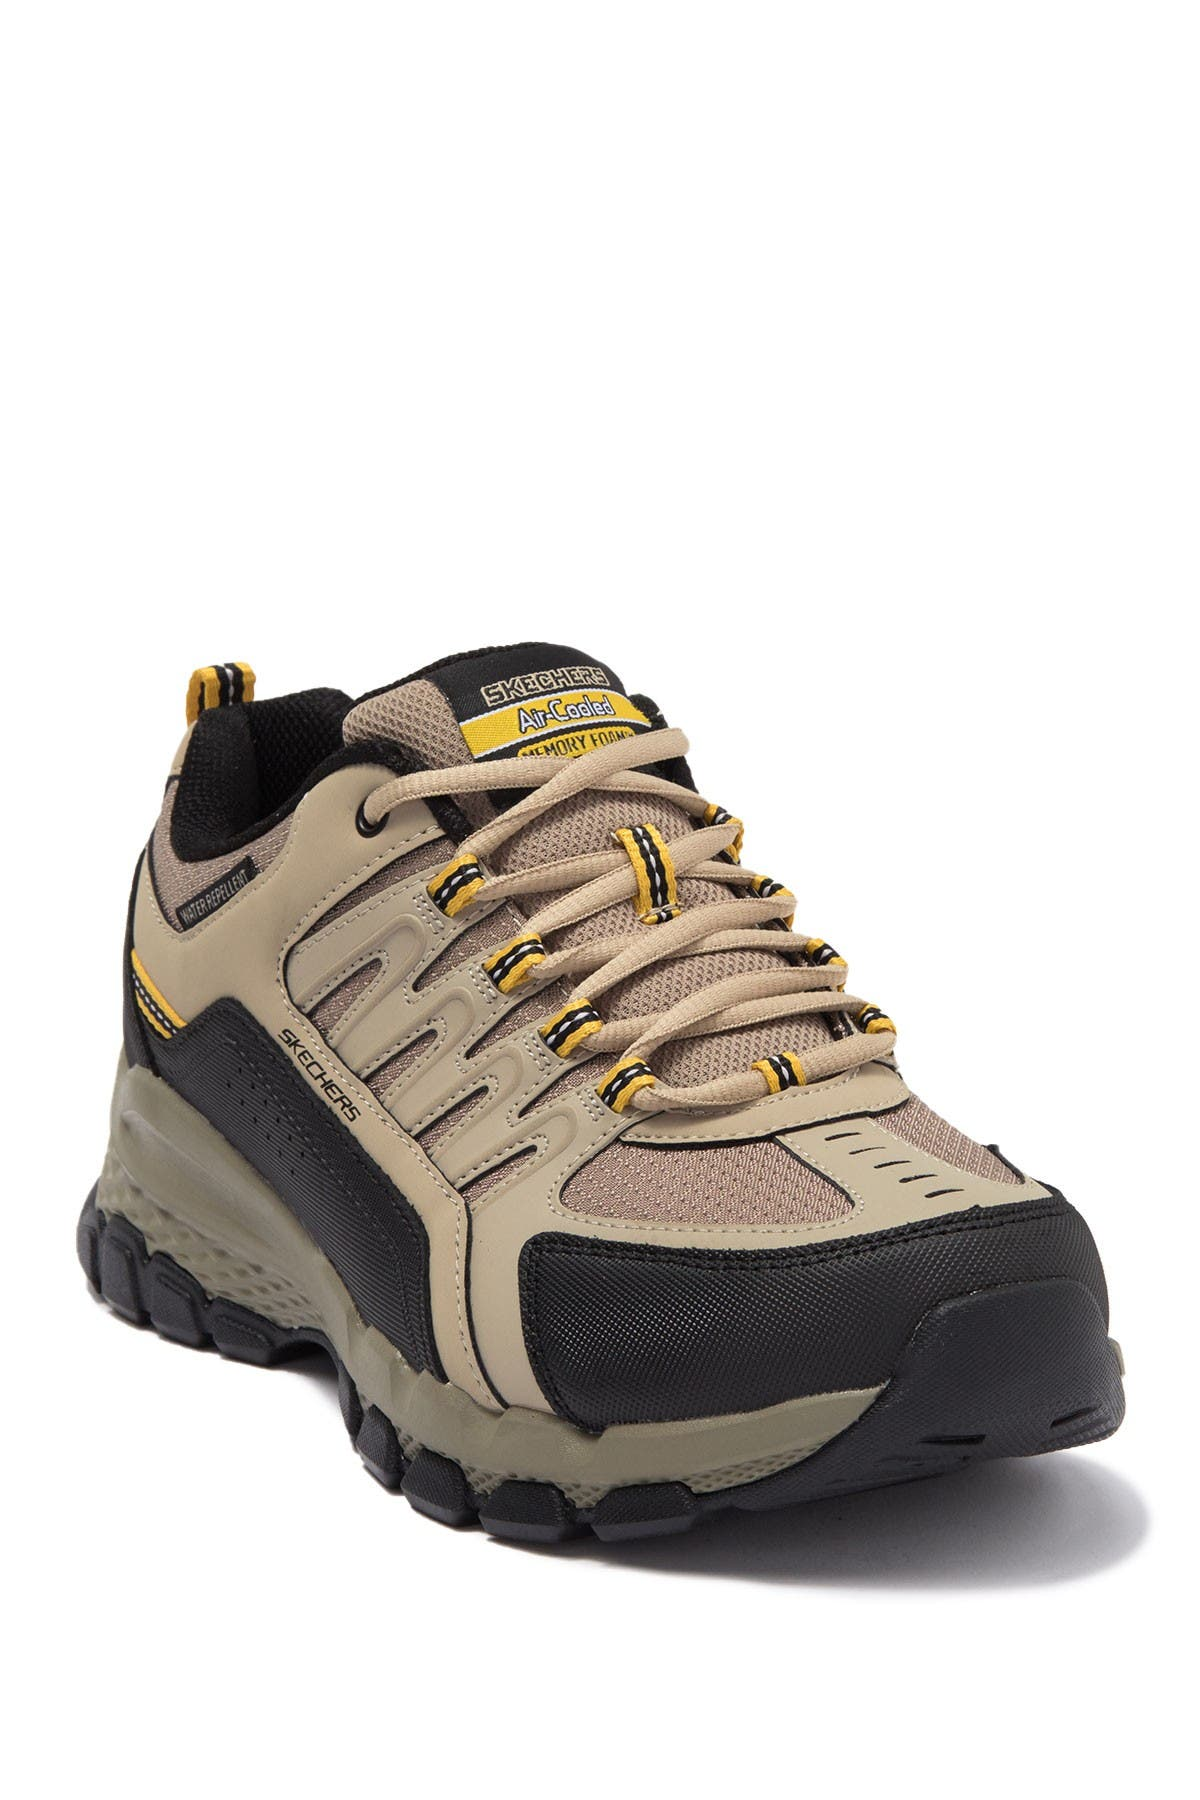 Image of Skechers Outland 2.0 Hiking Sneaker